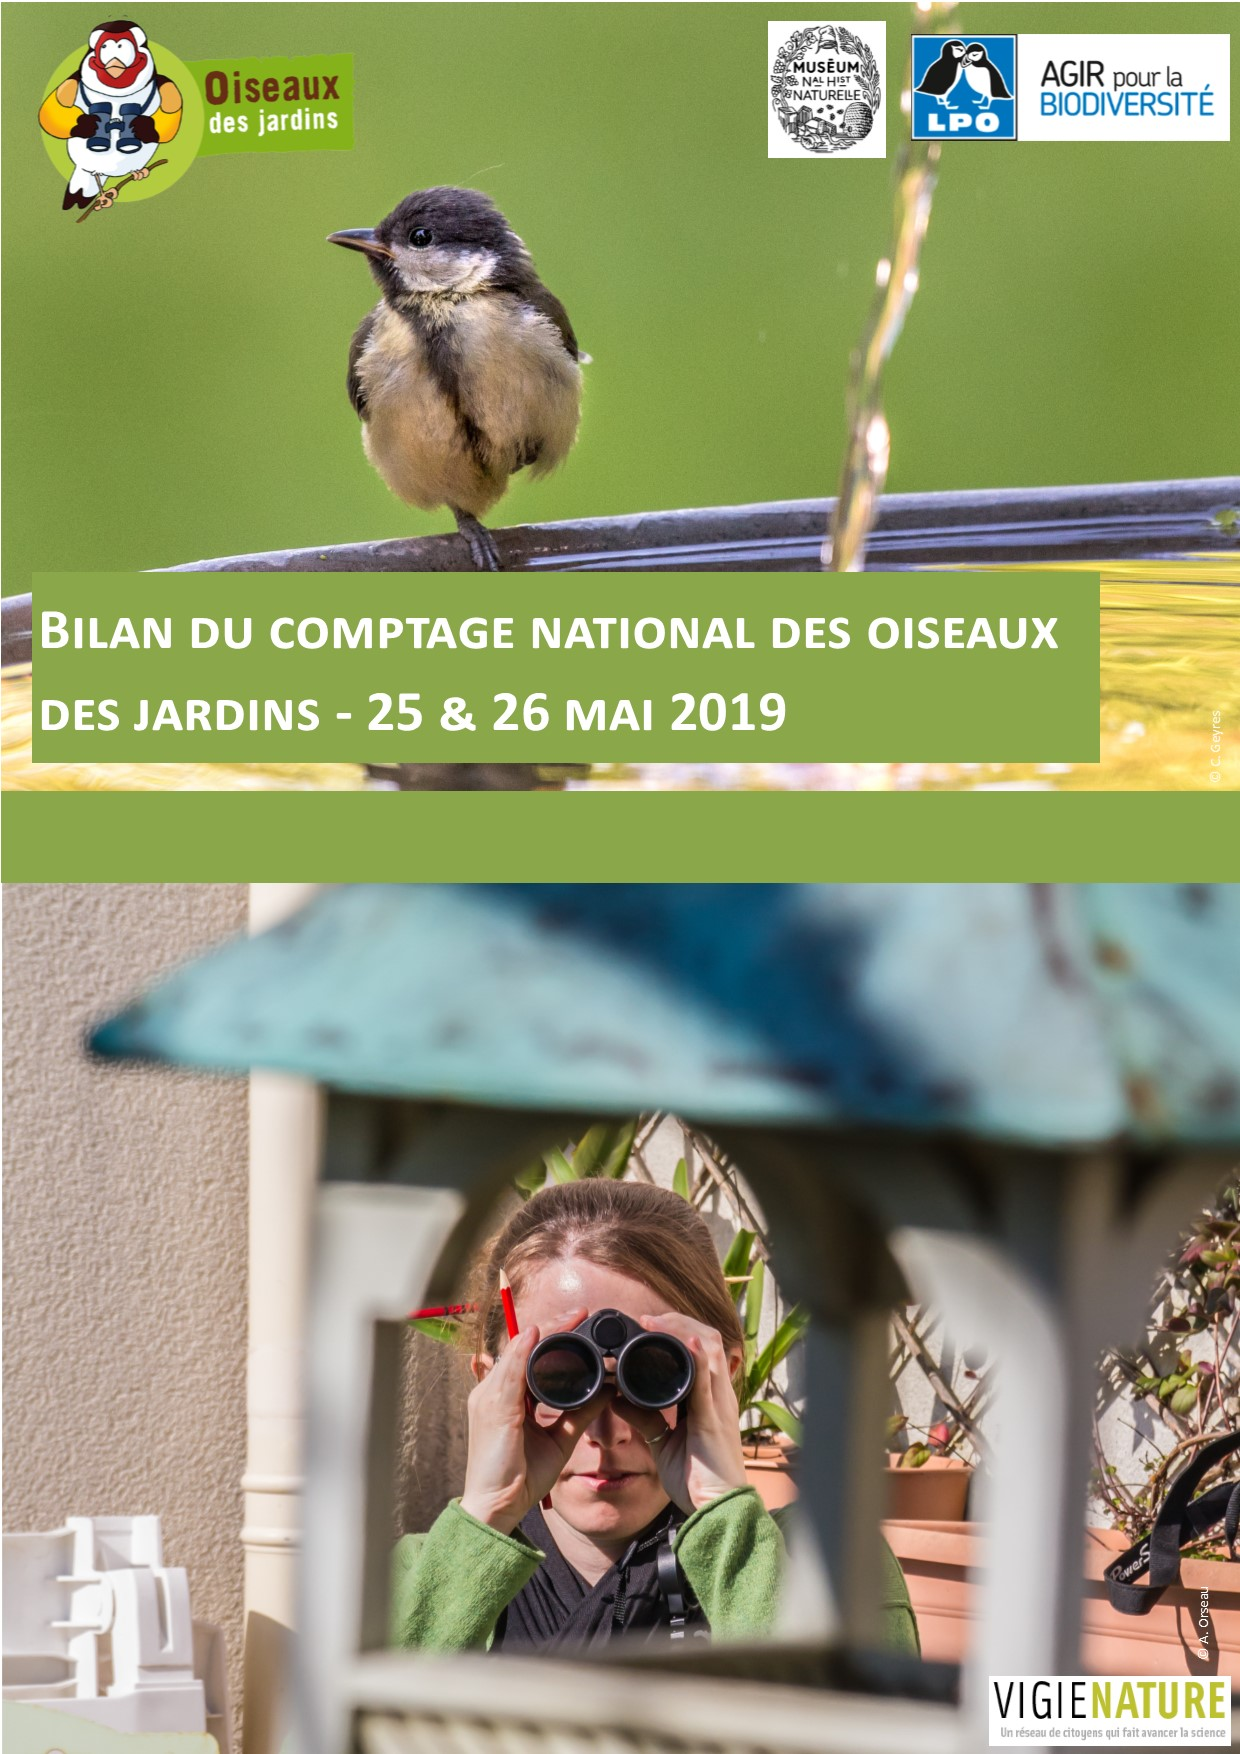 https://cdnfiles1.biolovision.net/www.oiseauxdesjardins.fr/userfiles/Bilancomptageodjmai2019cps.jpg